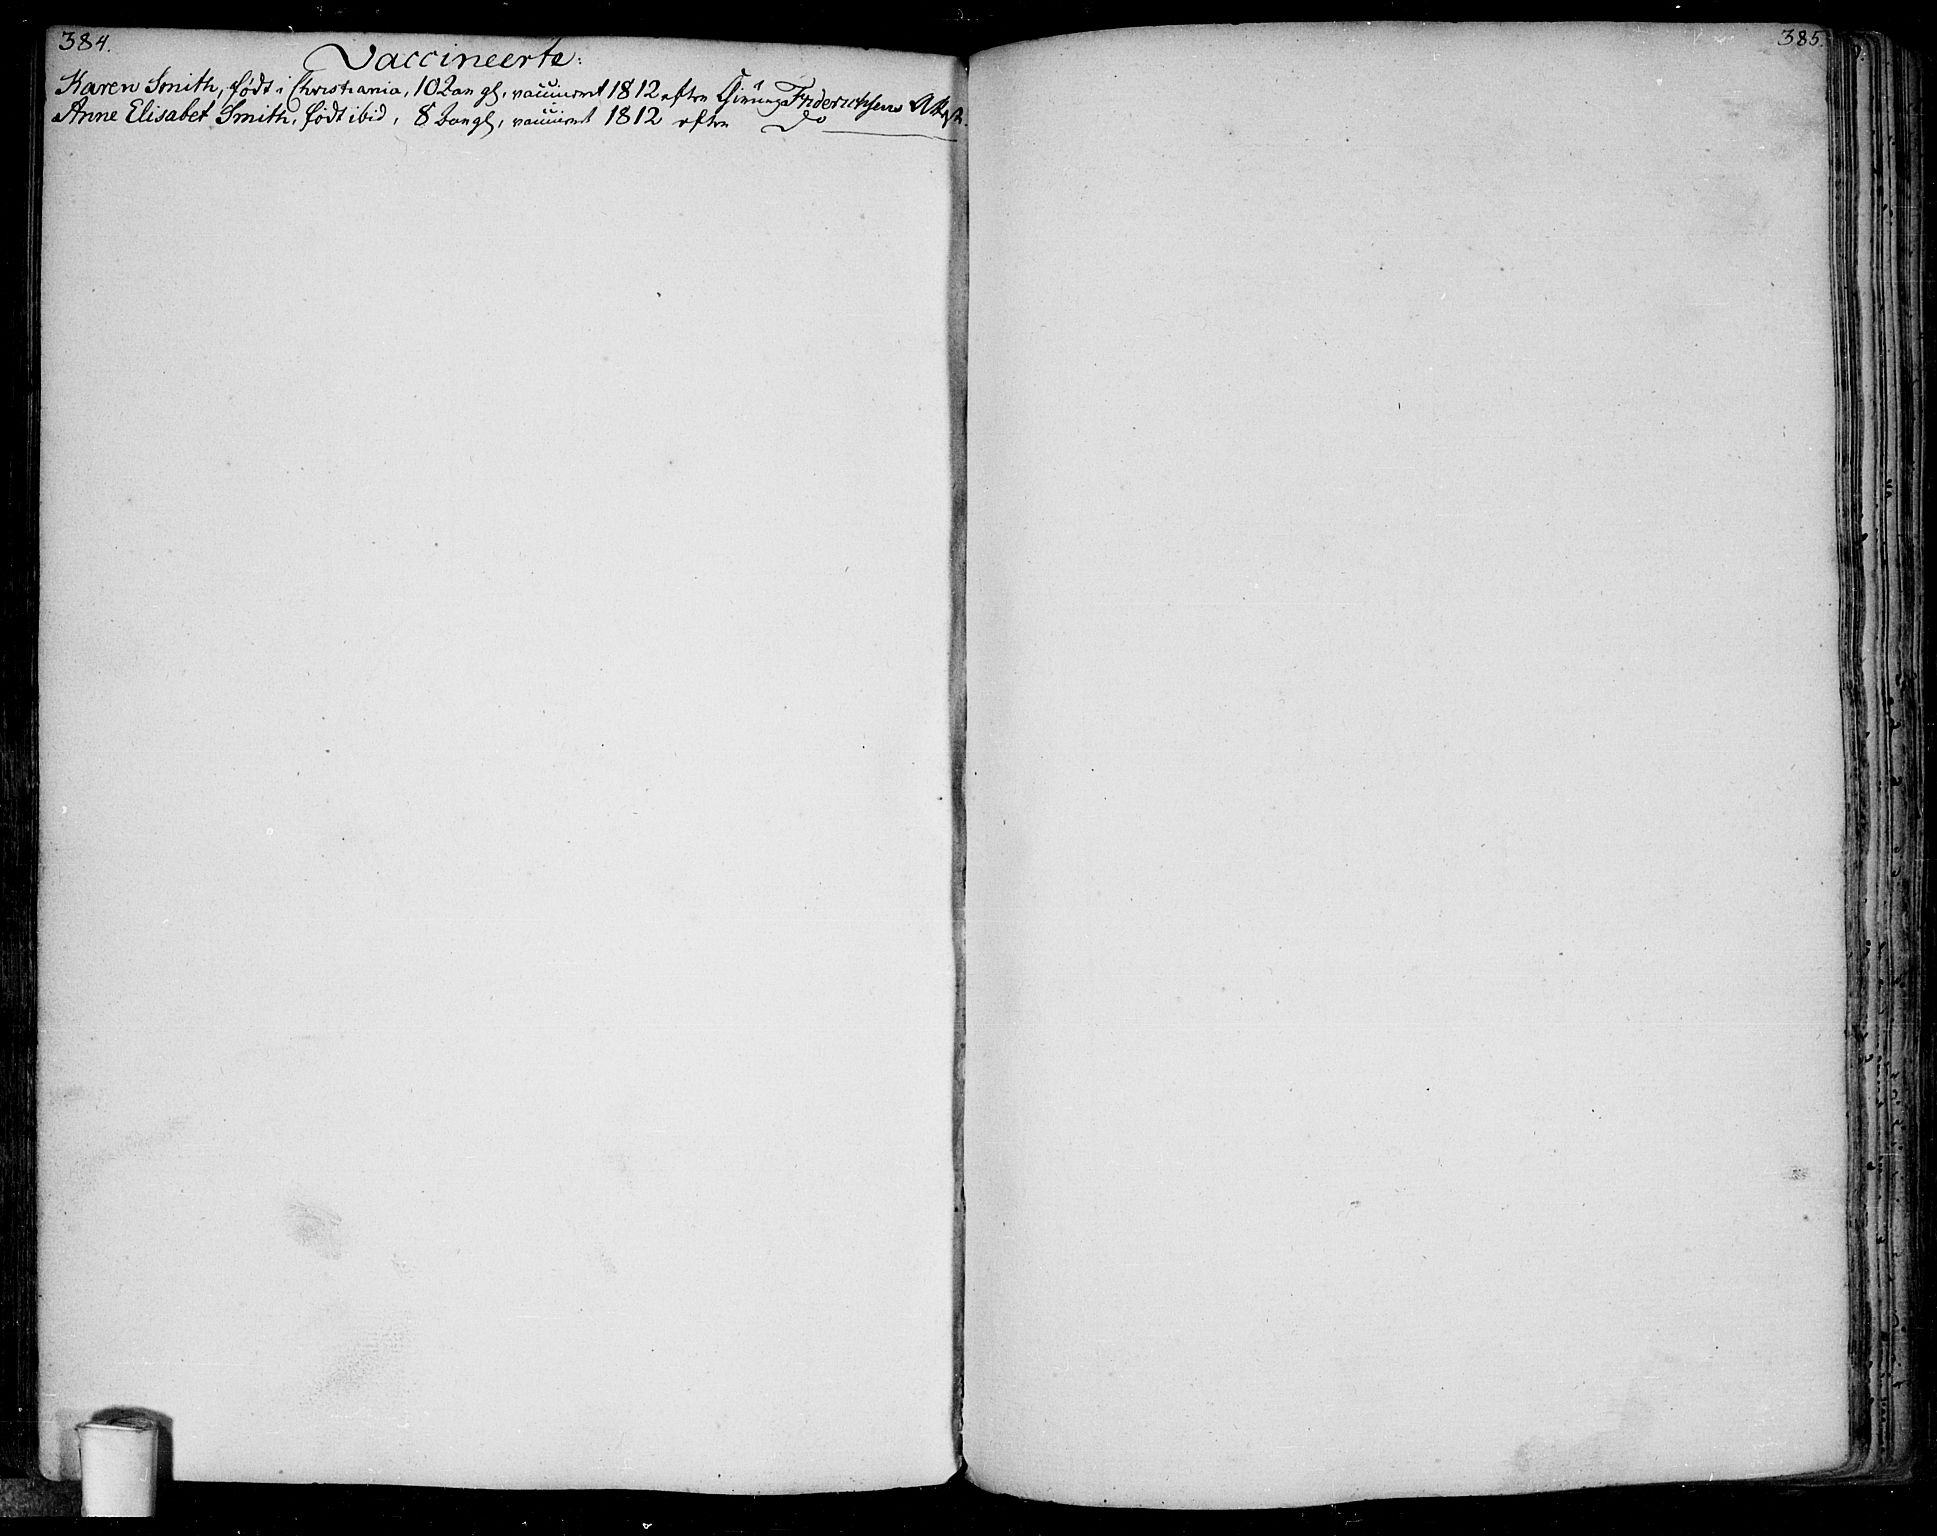 SAO, Rakkestad prestekontor Kirkebøker, F/Fa/L0005: Ministerialbok nr. I 5, 1784-1814, s. 384-385